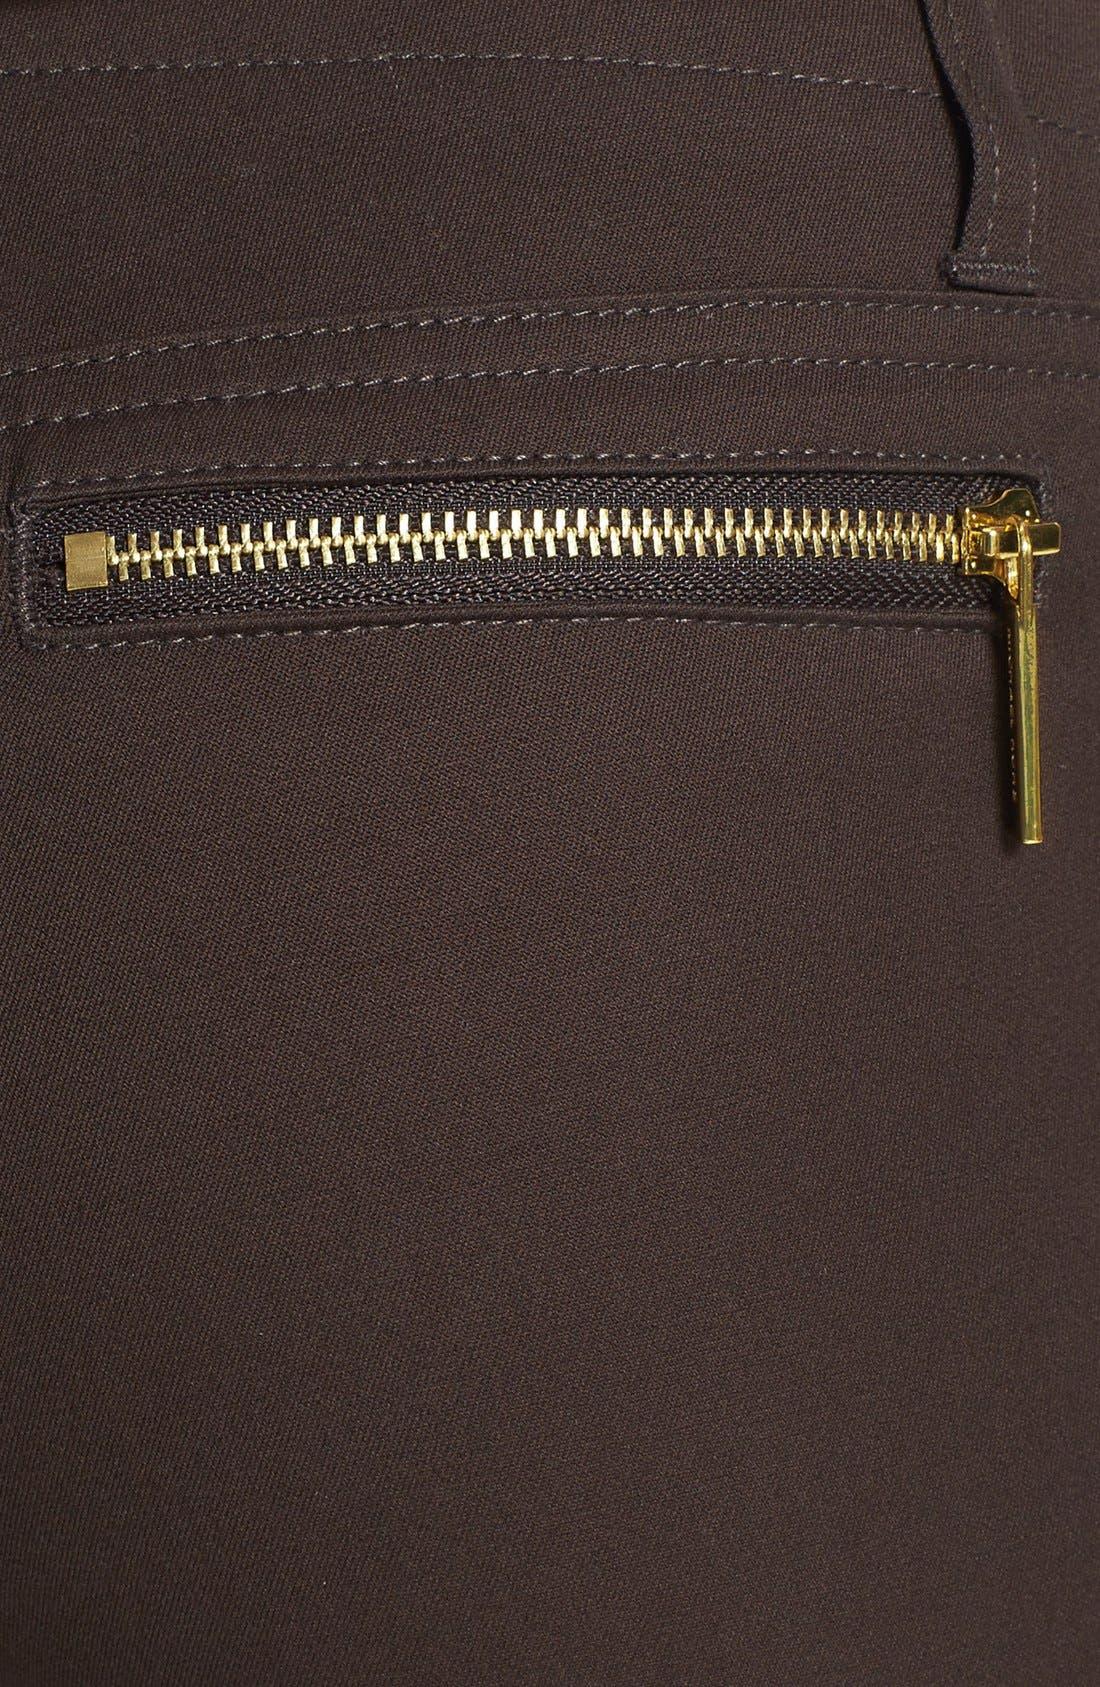 Zip Pocket Skinny Pants,                             Alternate thumbnail 4, color,                             201